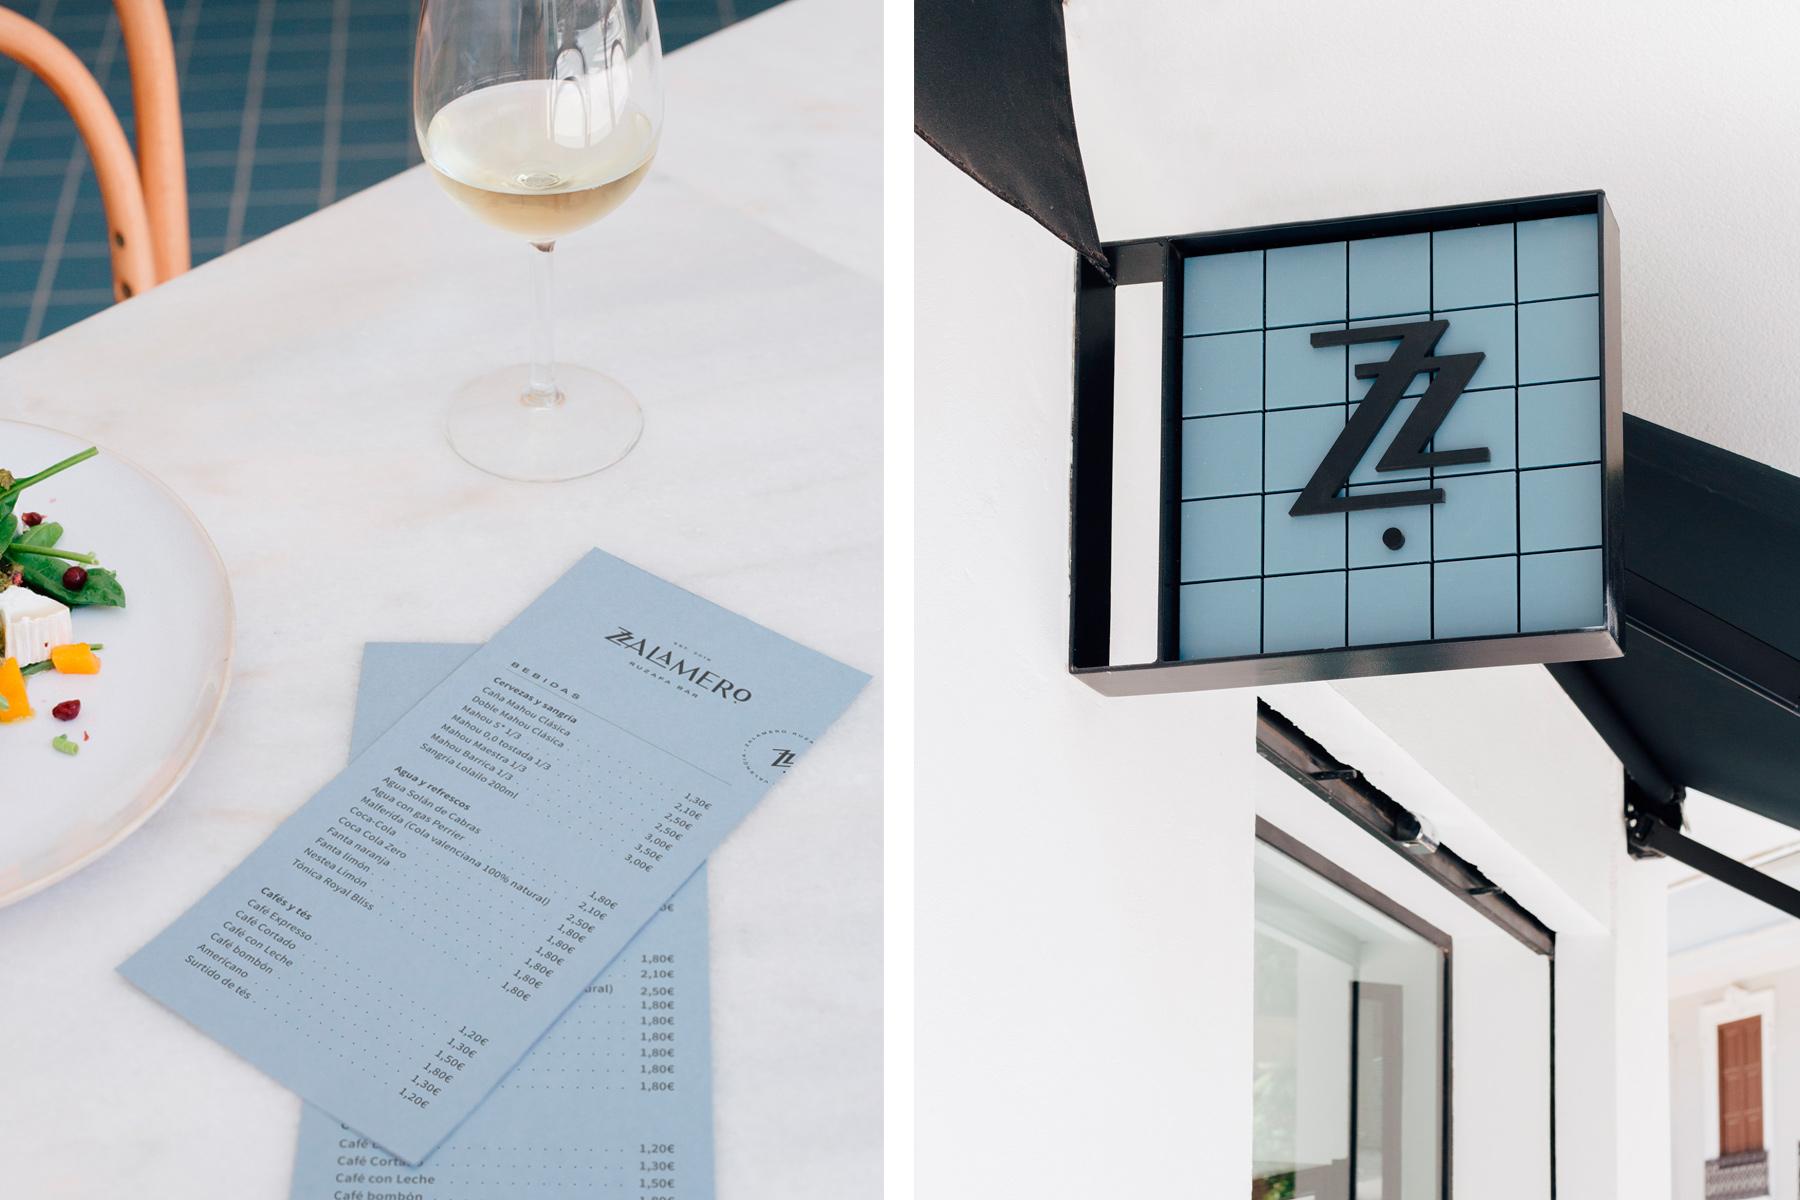 Diseño de carta bebidas para Zalamero Ruzafa Bar en Valencia